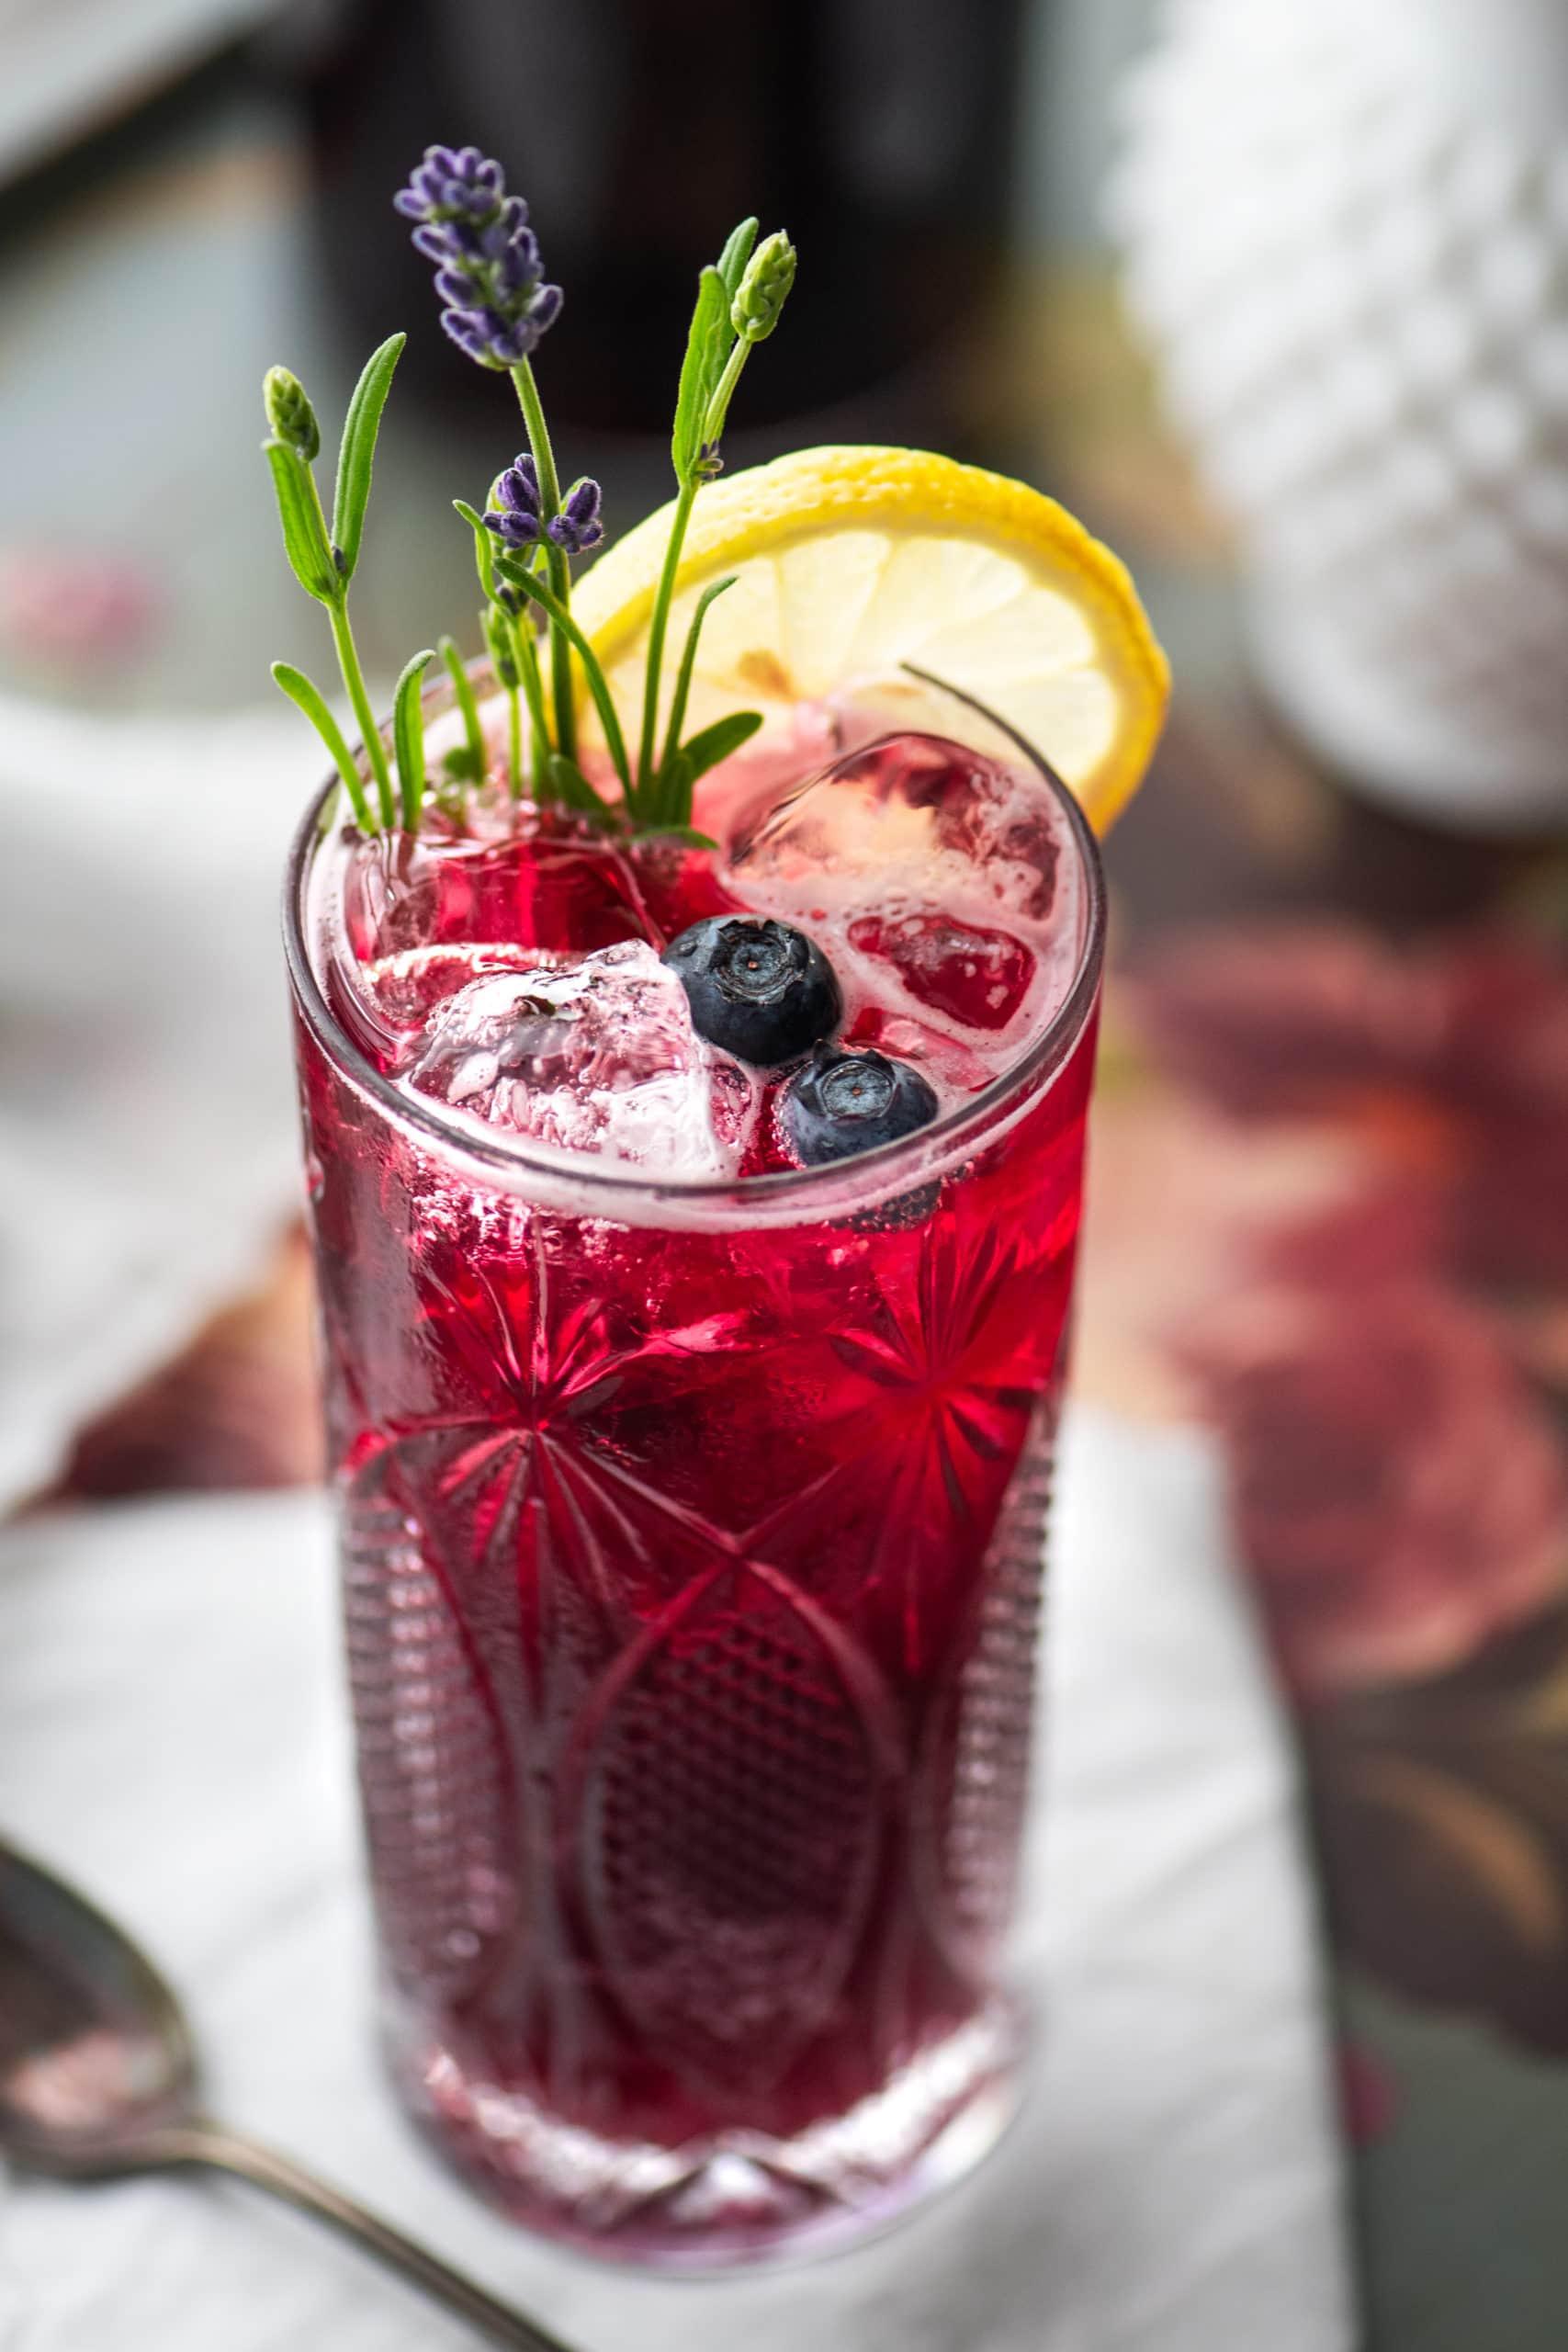 Blueberry Lavender Soda 6873 Cropped scaled - Blueberry Lavender Soda